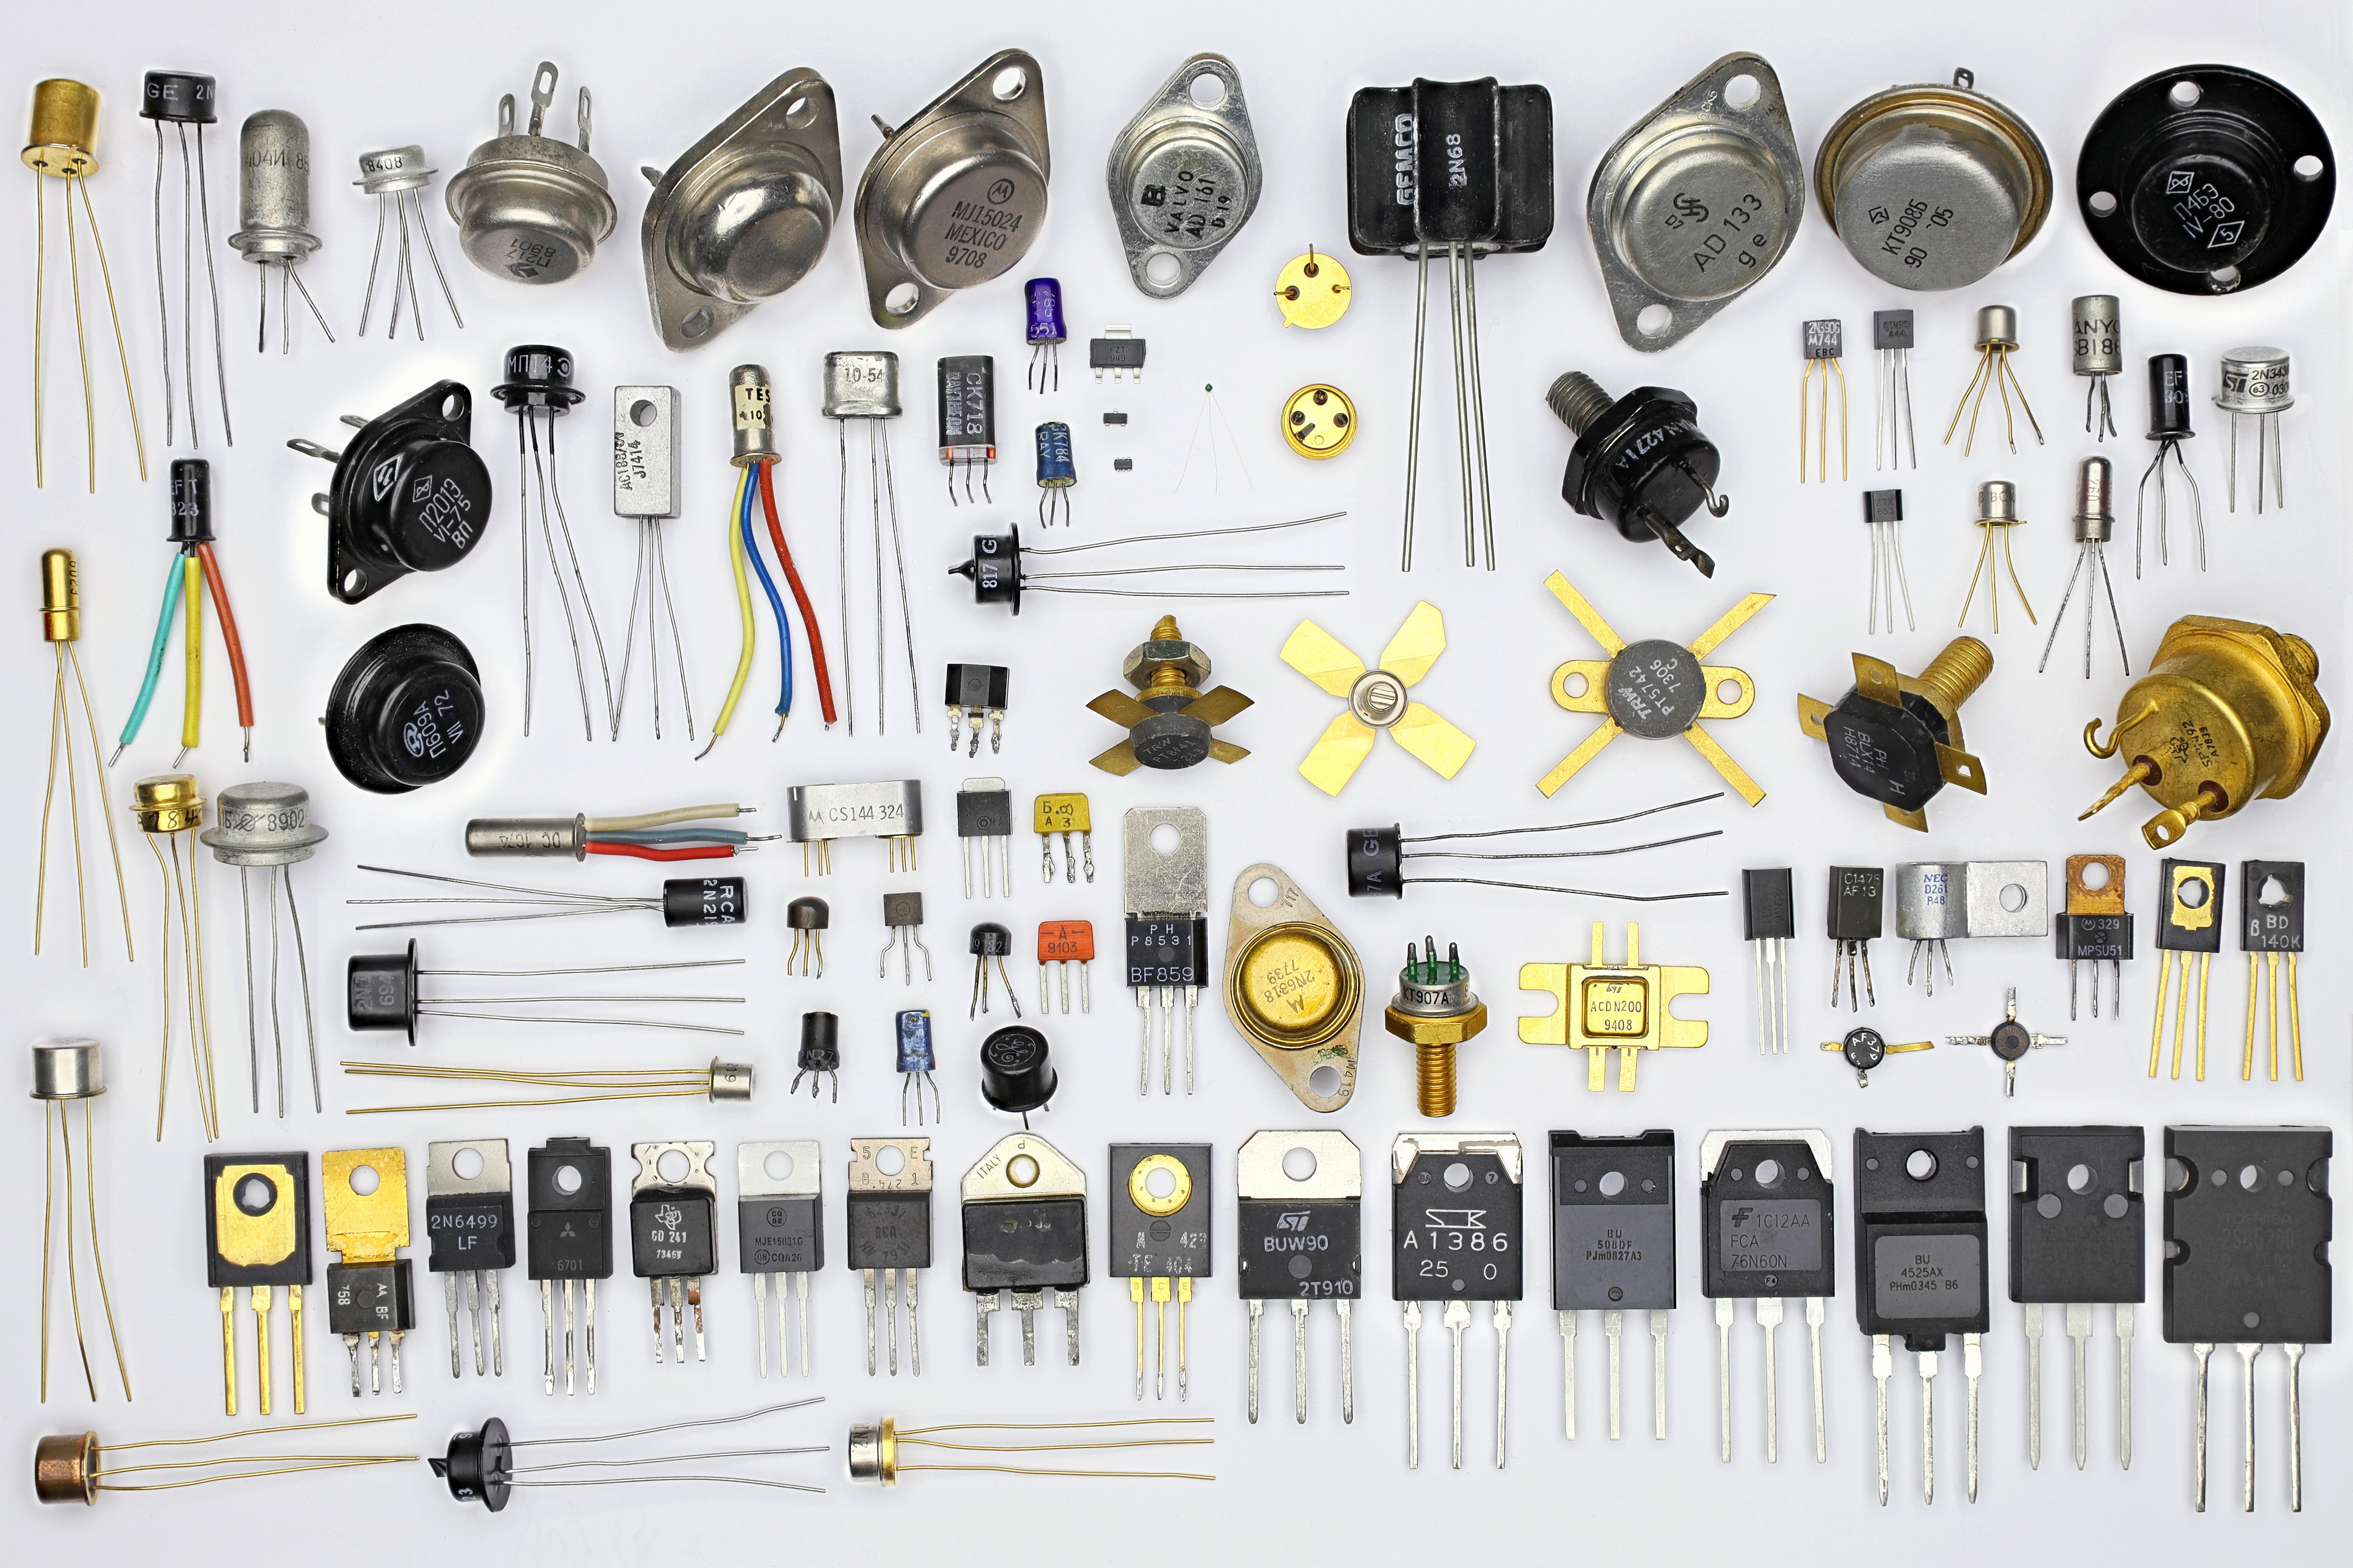 File:Transistor-photo.JPG